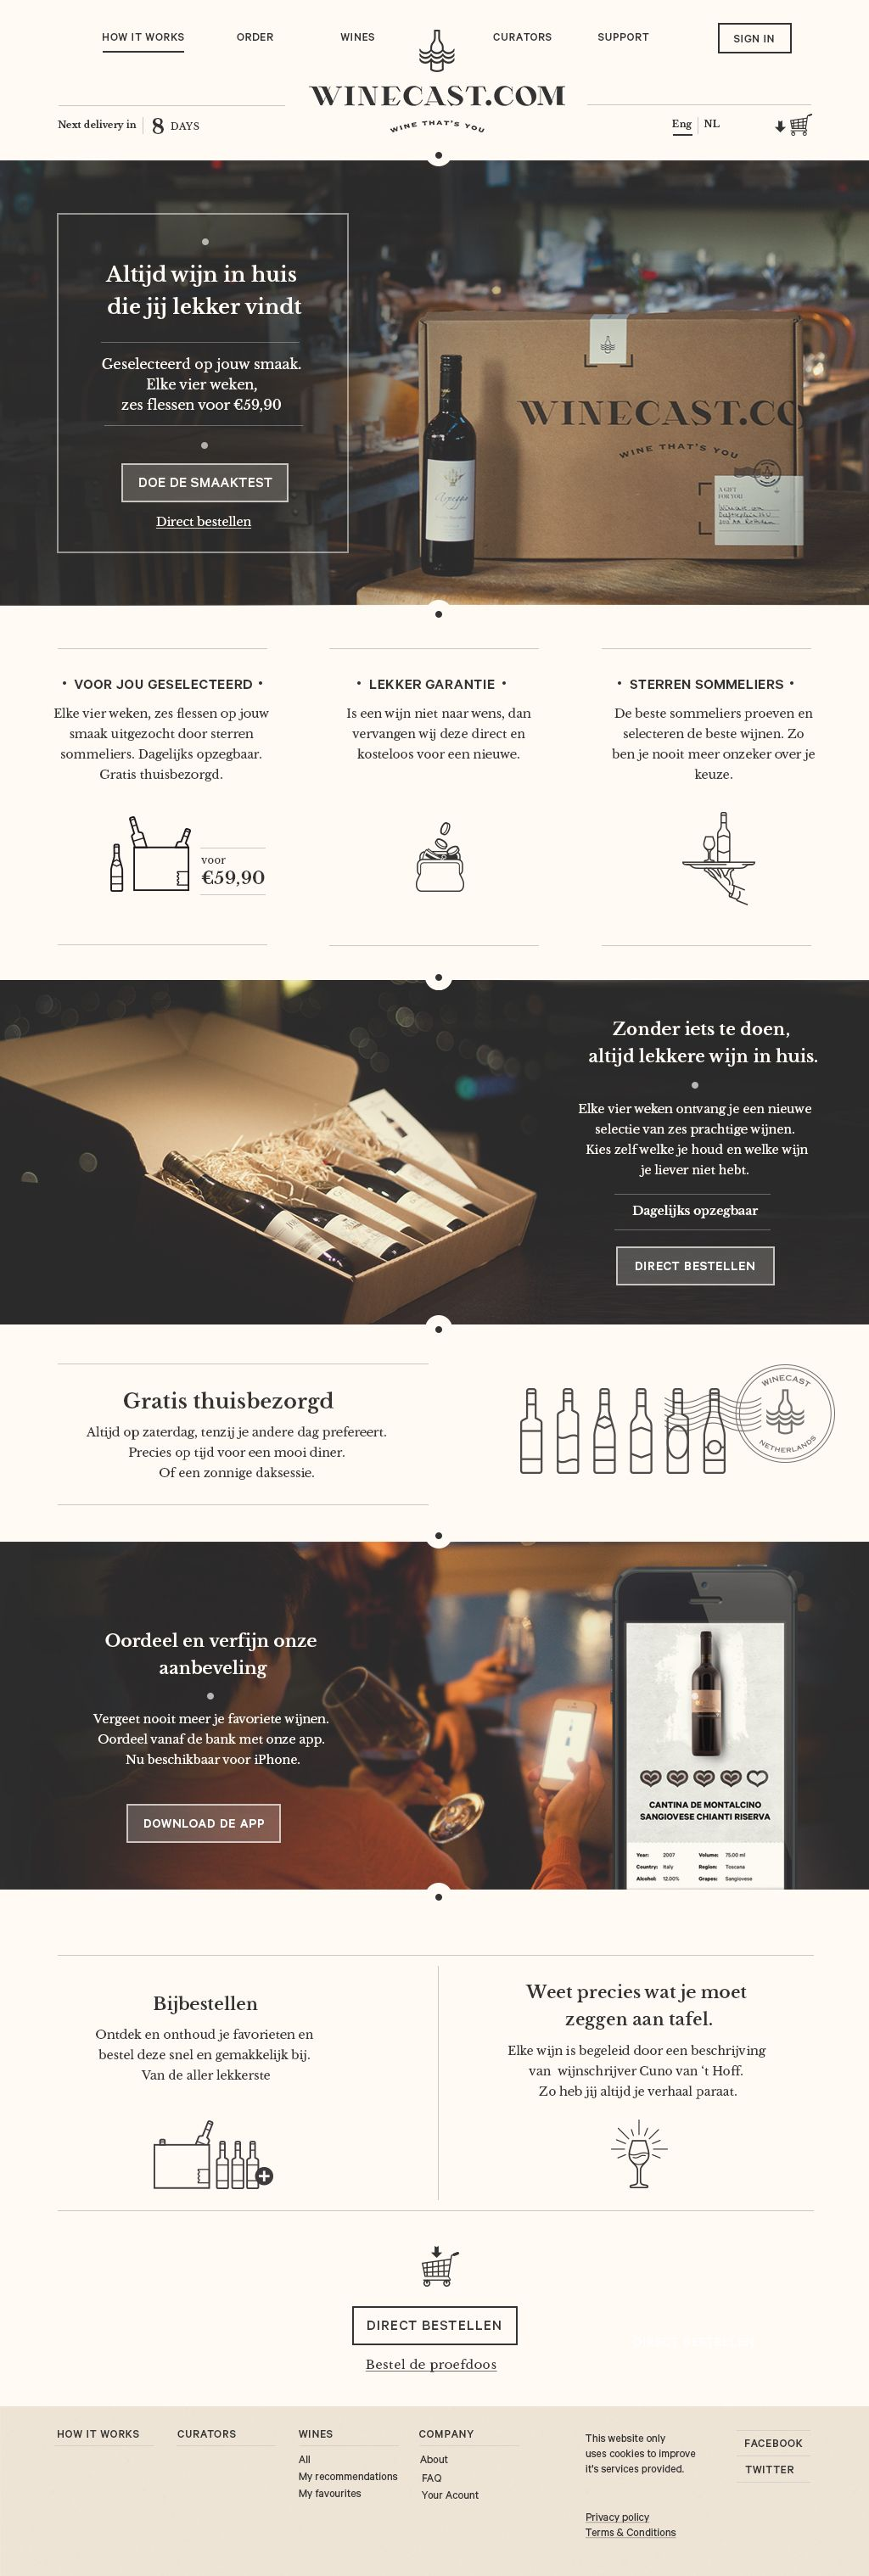 Winecast.com   #webdesign #it #web